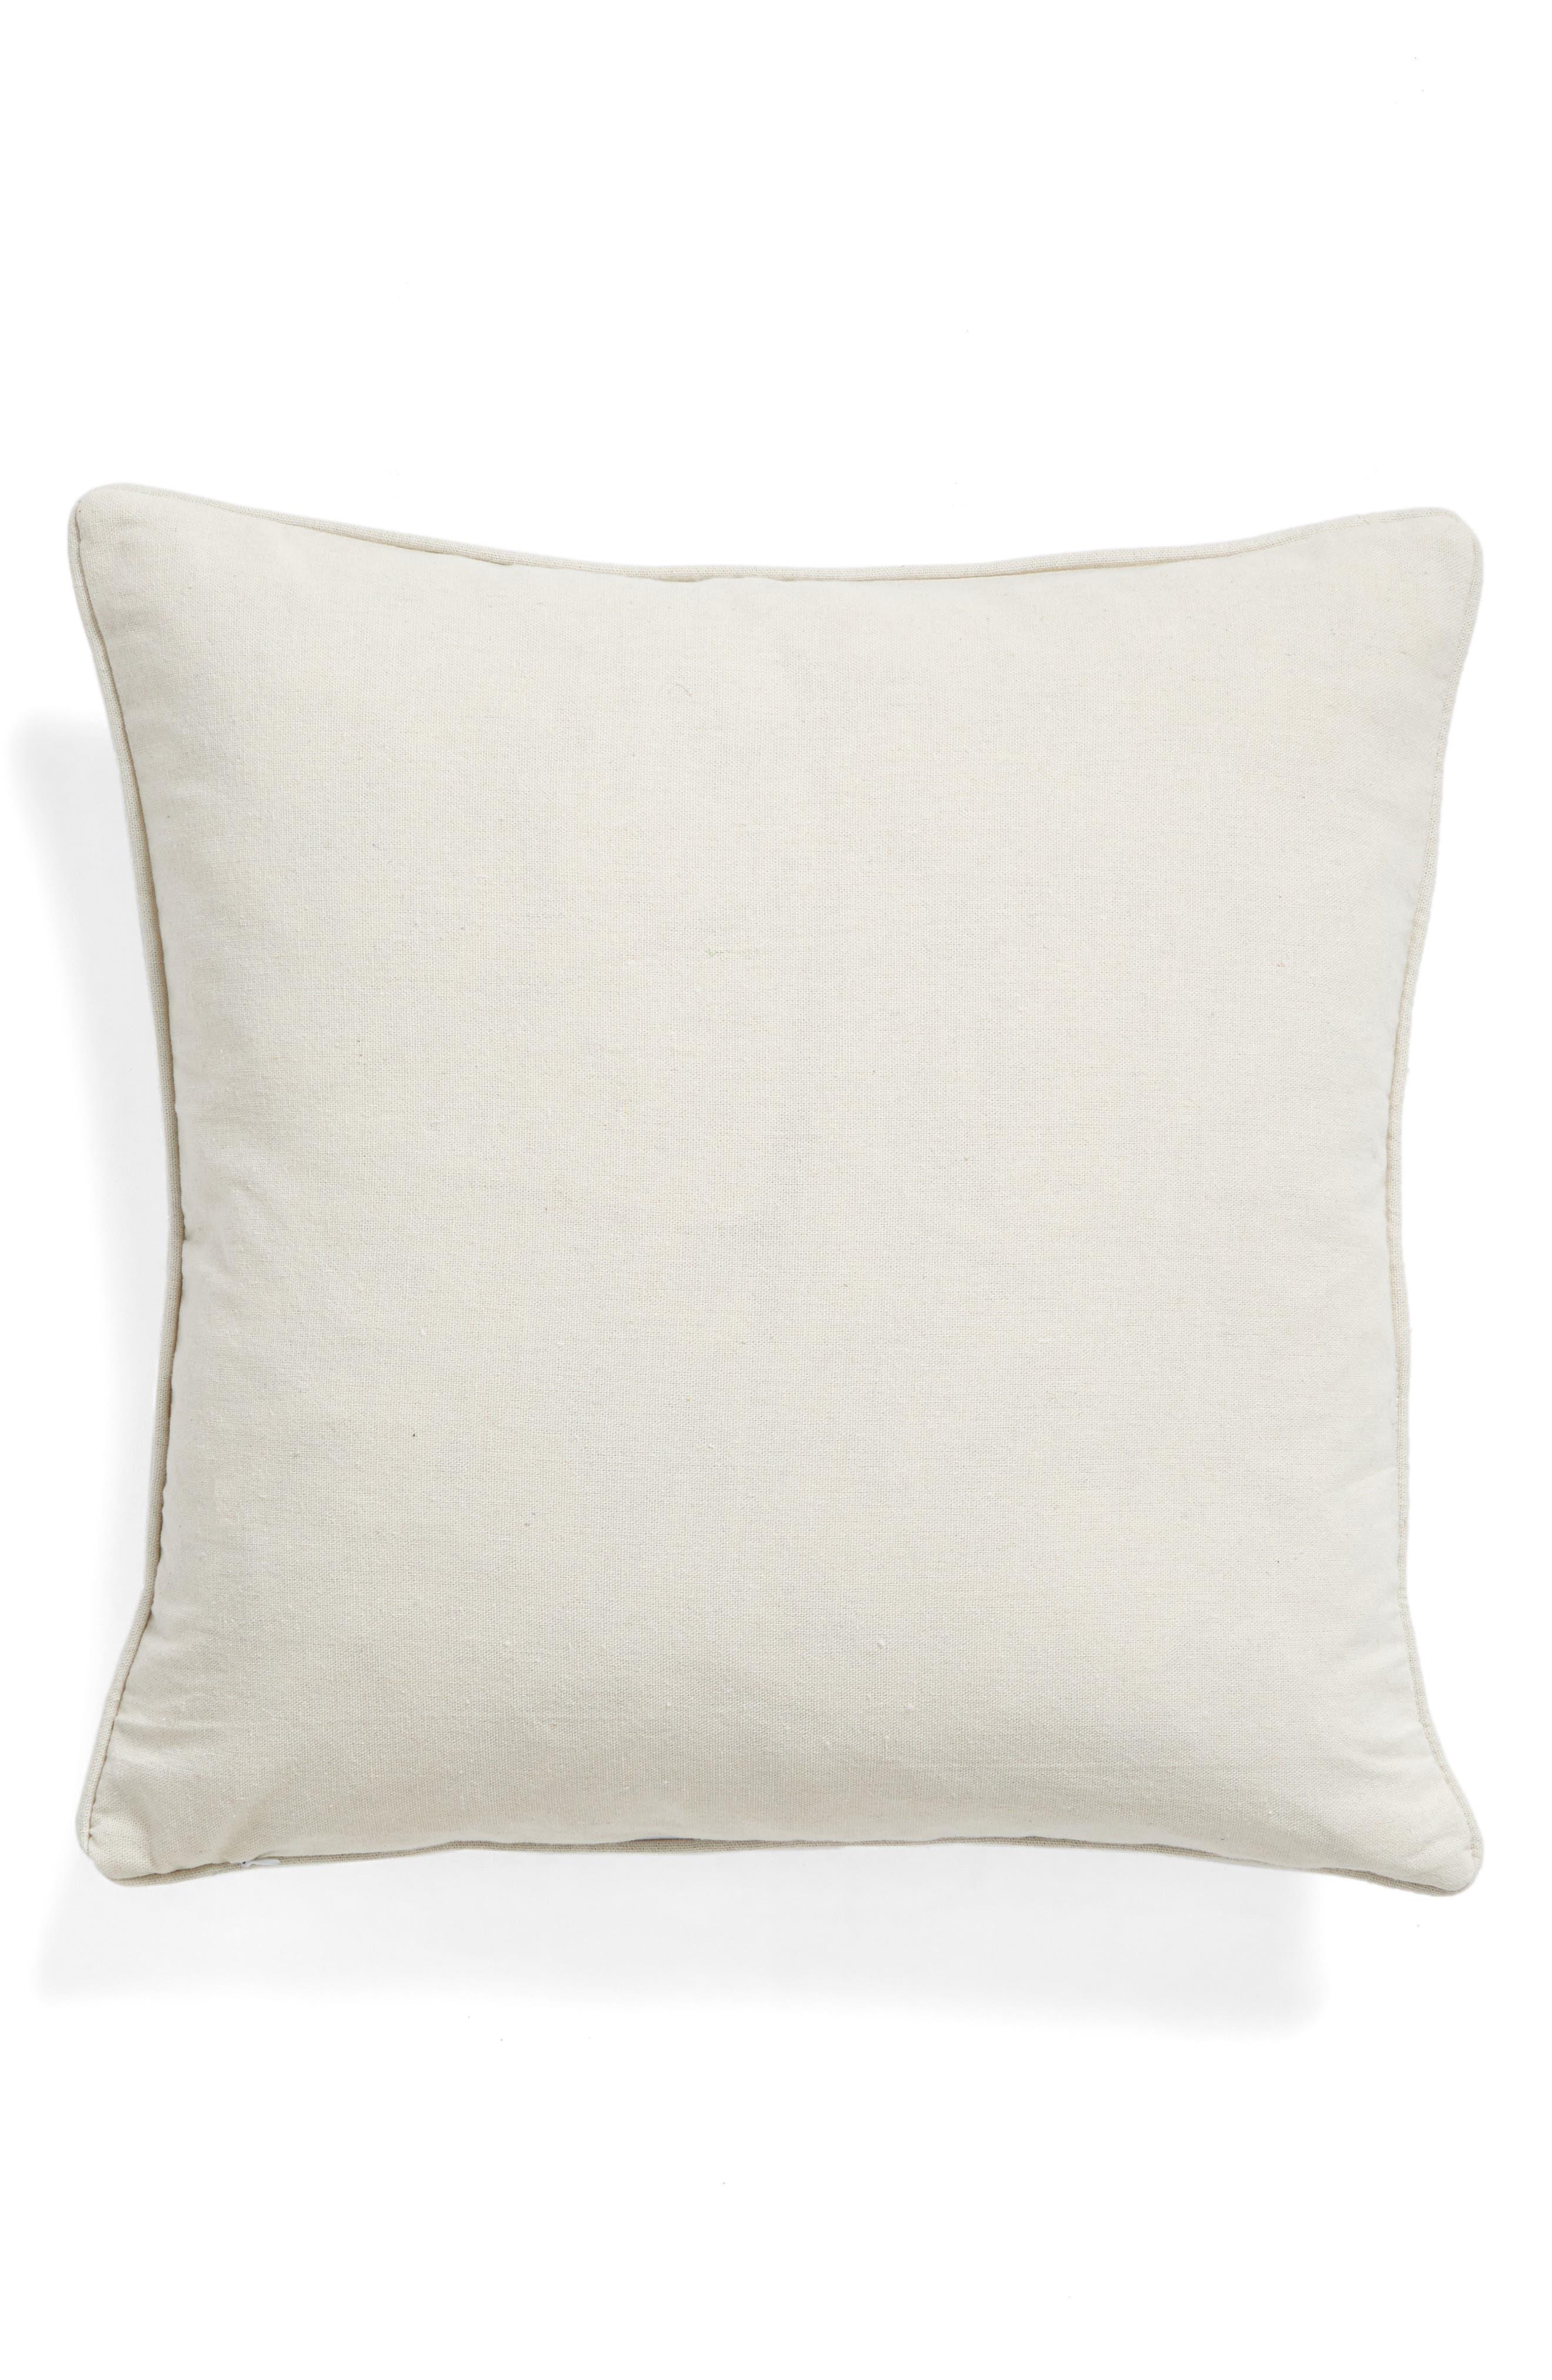 Mother Accent Pillow,                             Alternate thumbnail 2, color,                             900